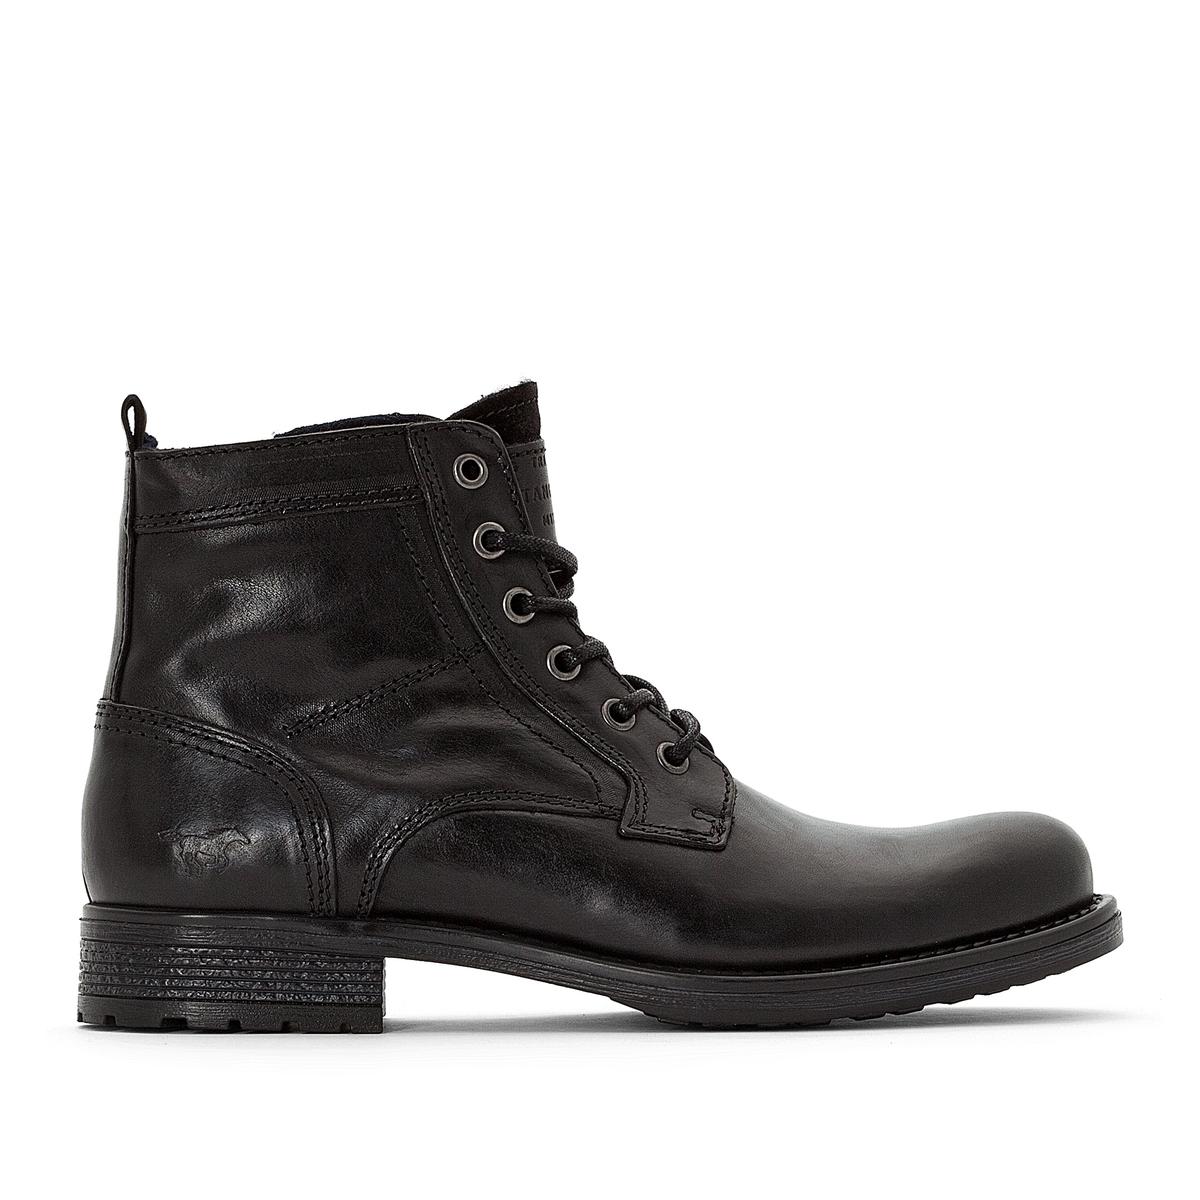 Ботинки кожаные на шнуровке цены онлайн